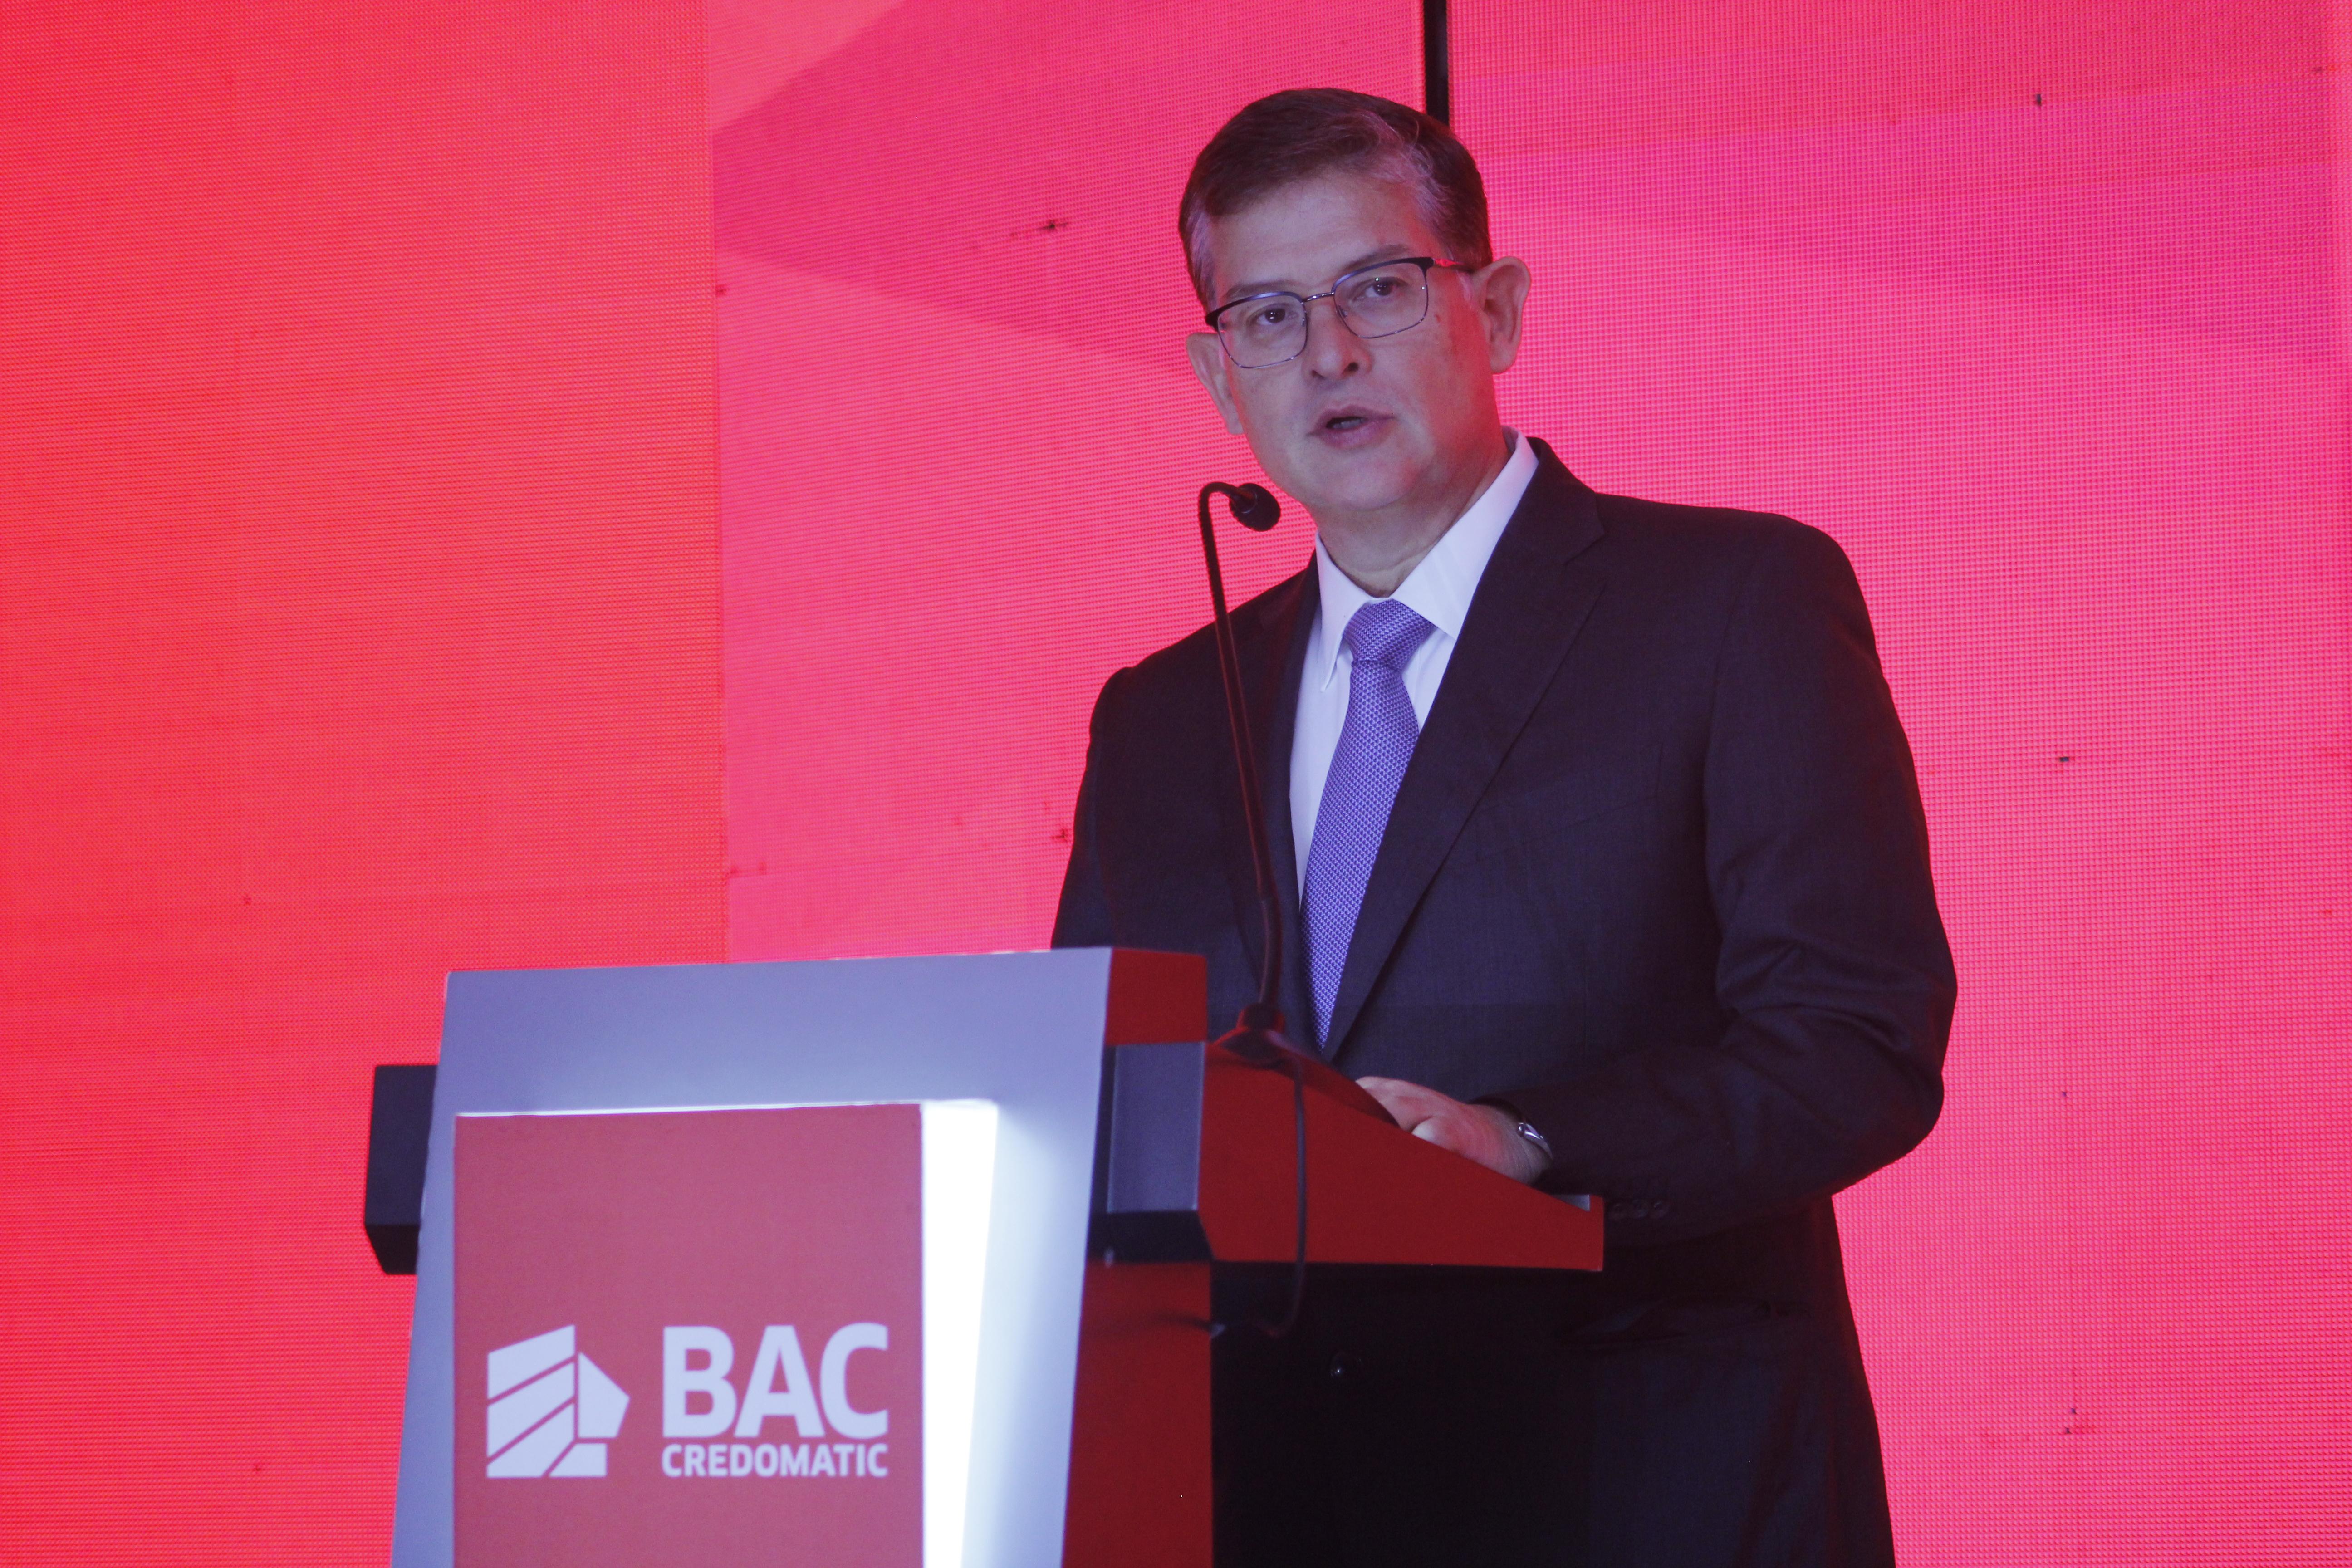 El presidente del BAC Credomatic, Fernando González,